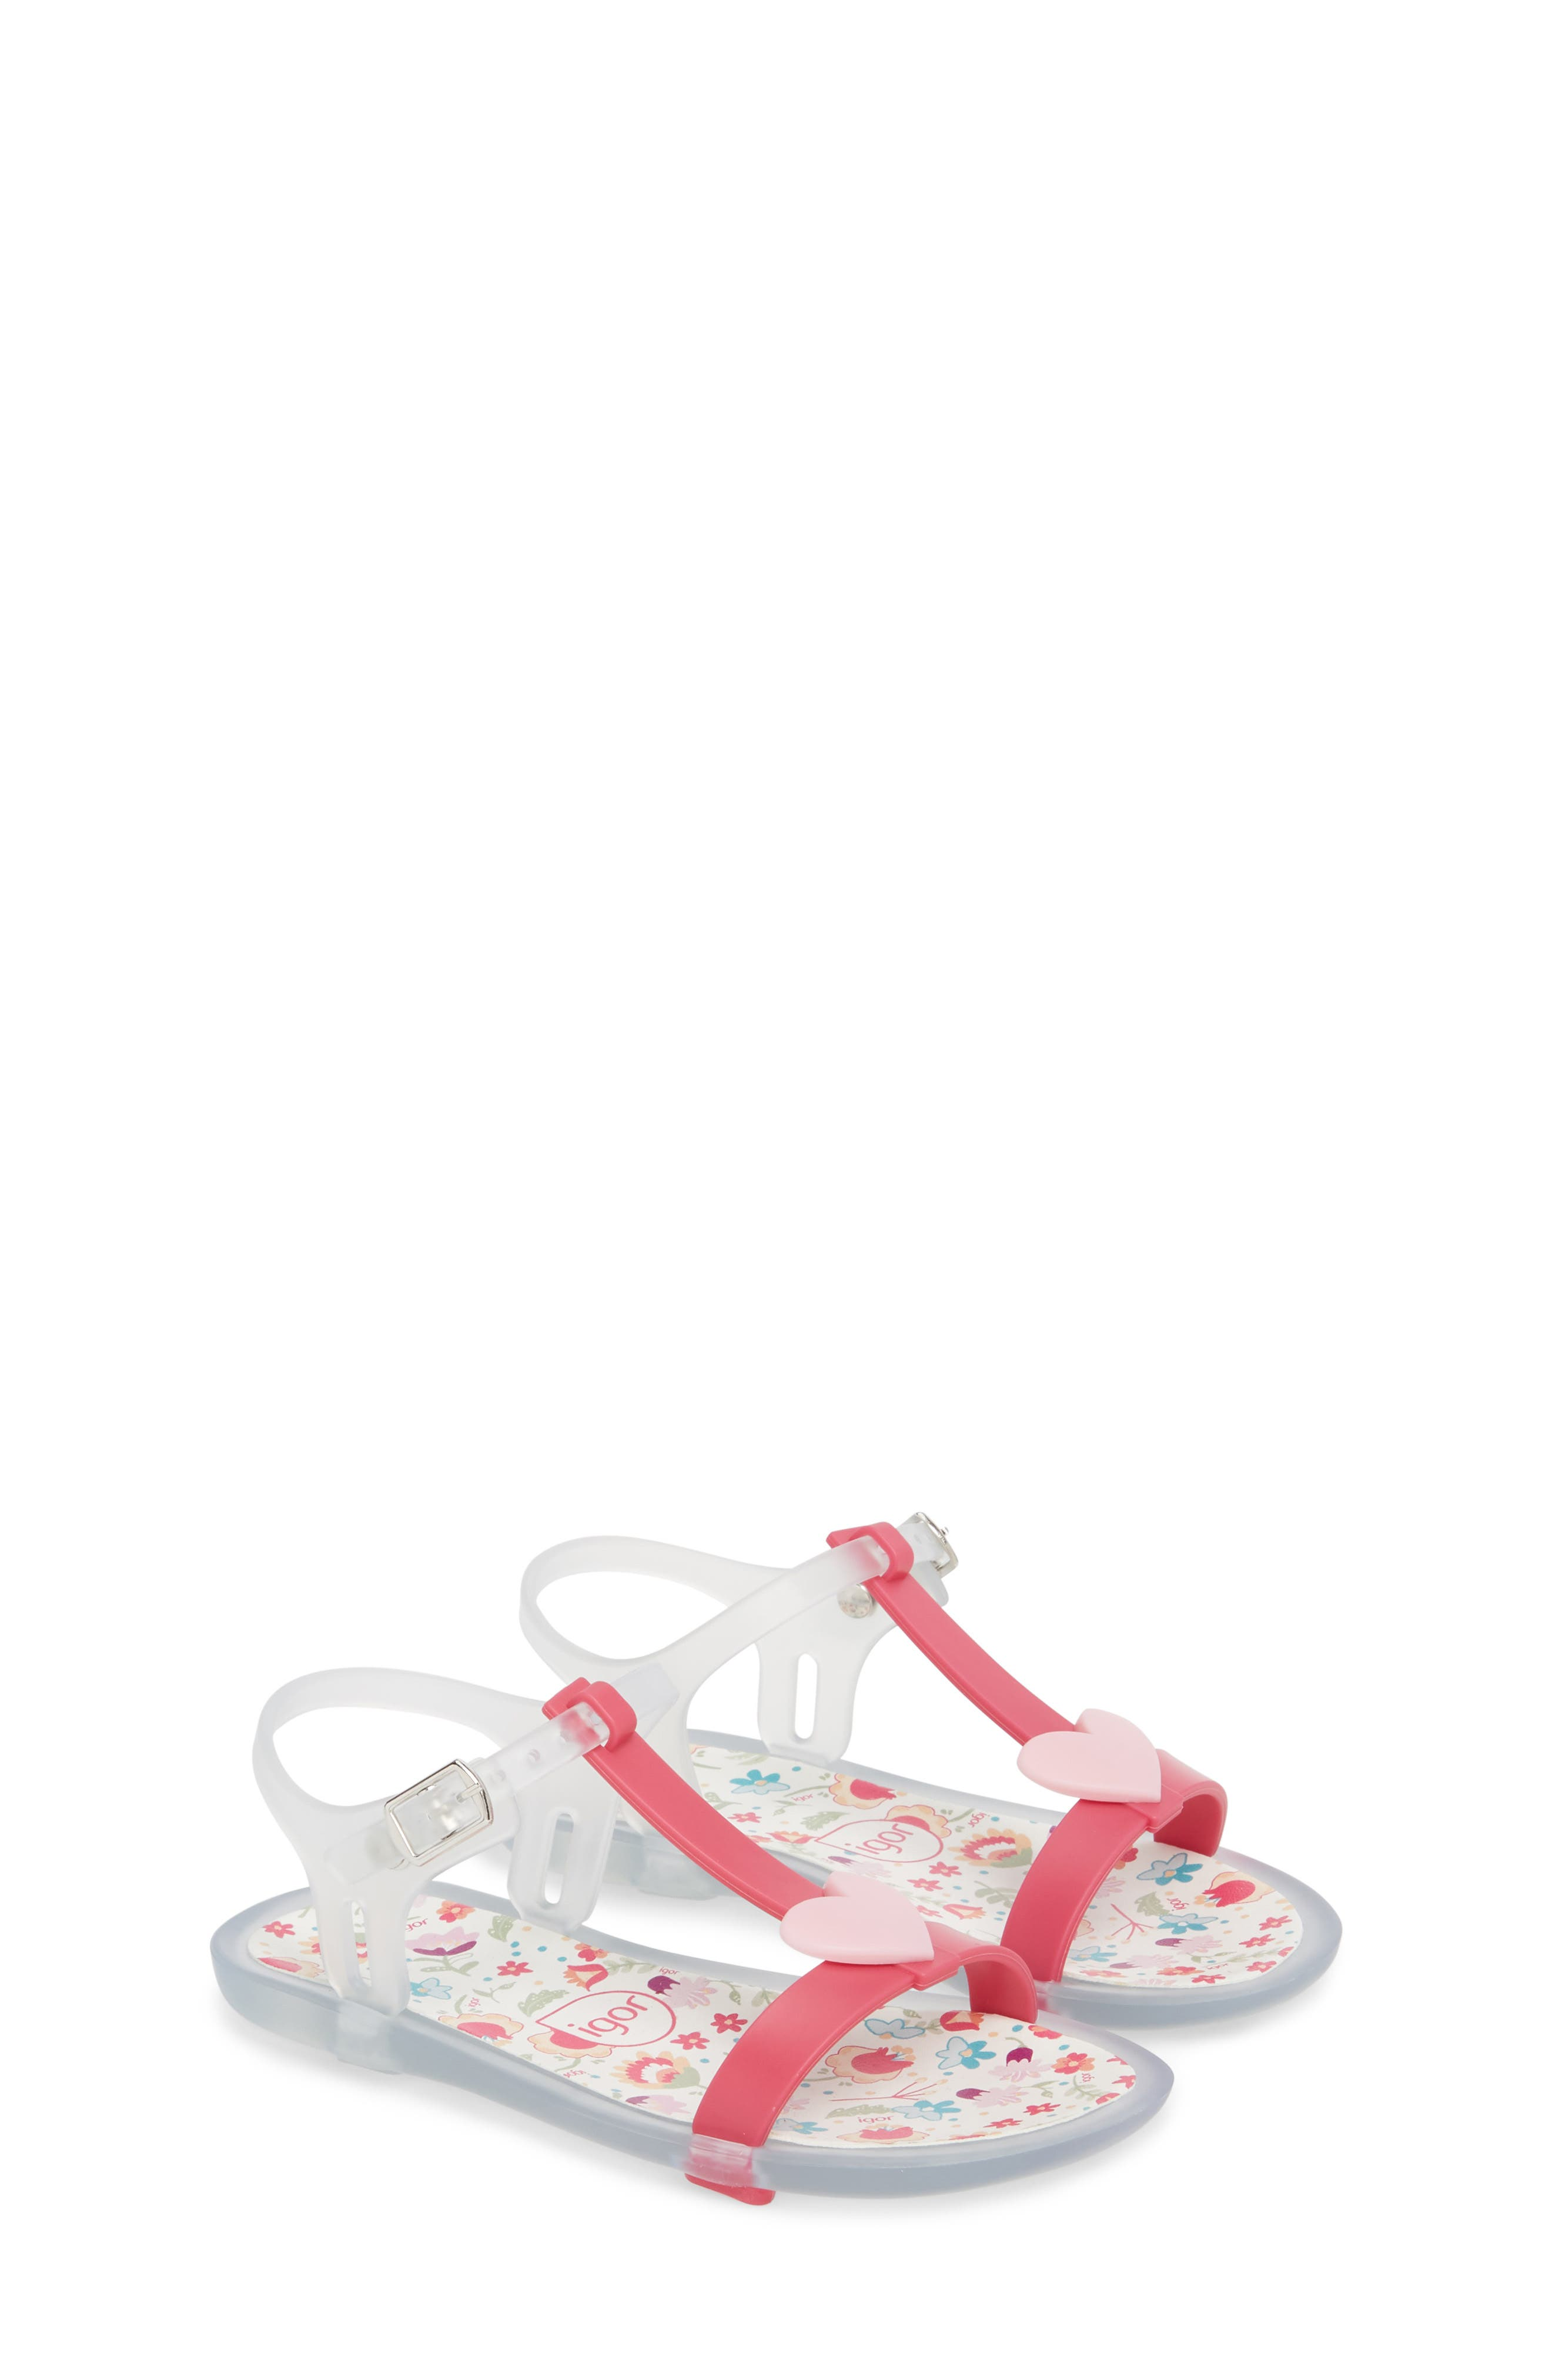 Tricia Cuore T-Strap Sandal,                             Main thumbnail 1, color,                             660